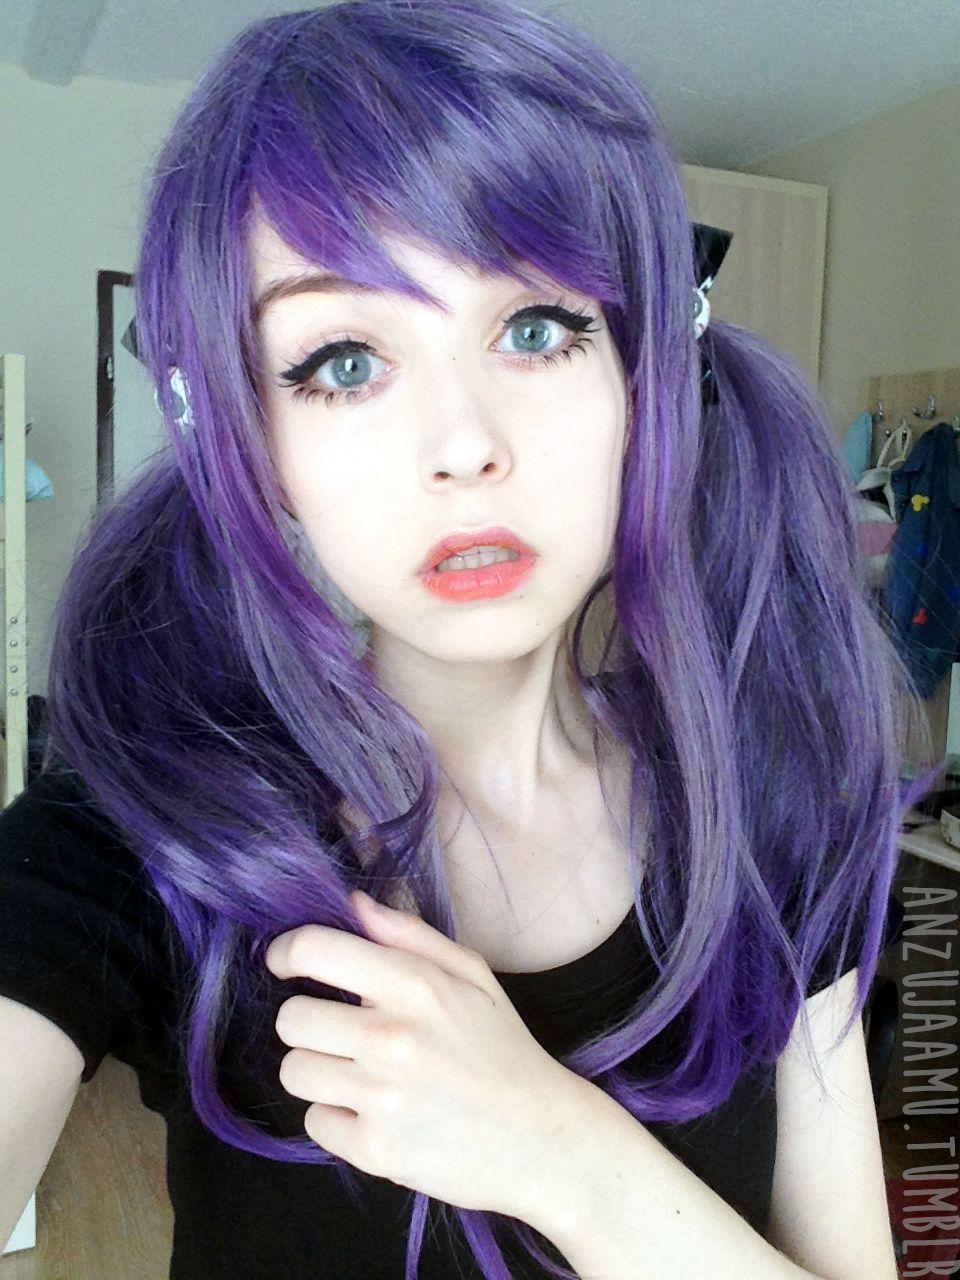 Look - Girls tumblr with light purple hair video